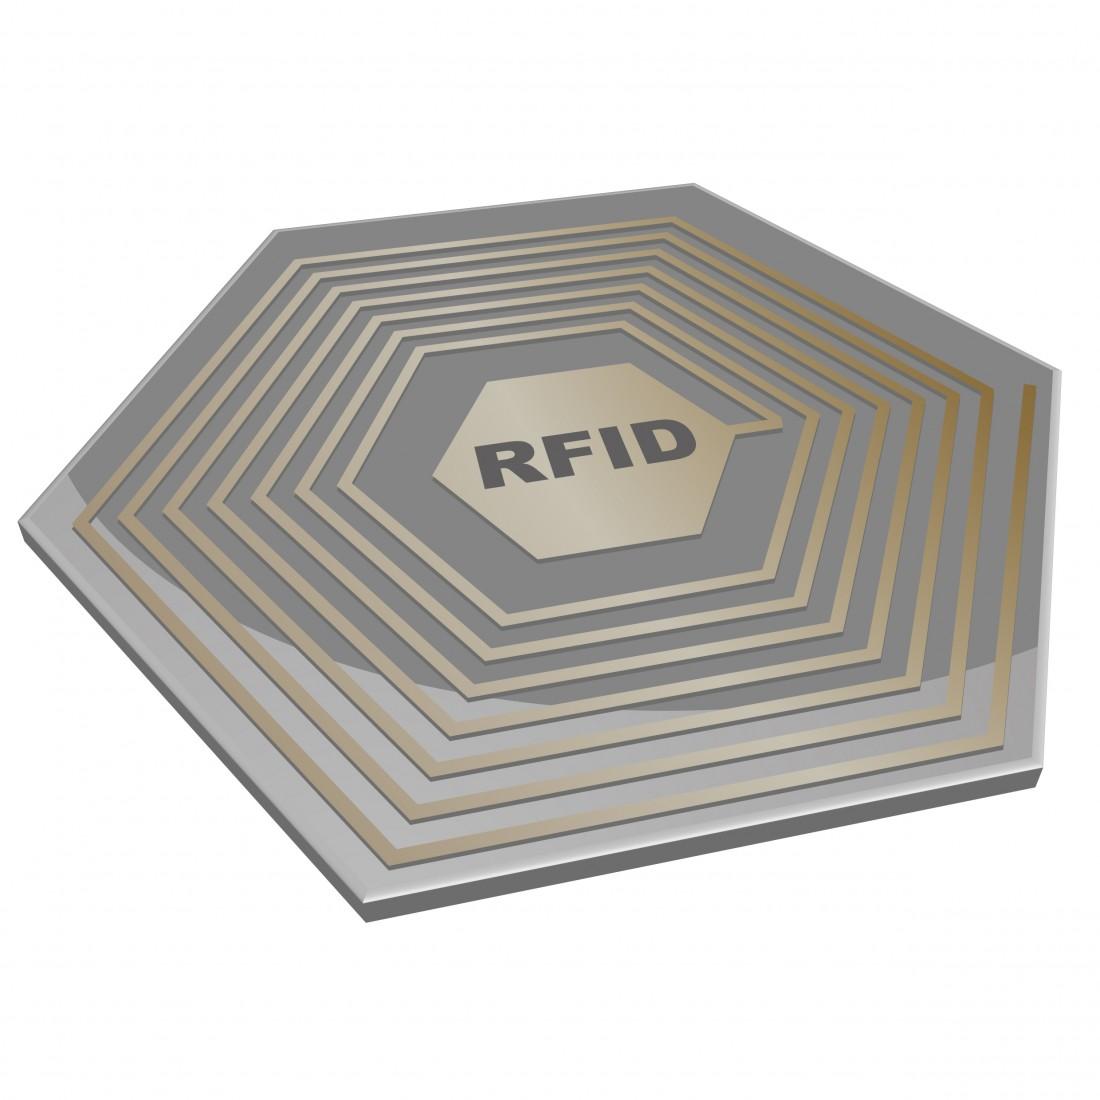 RFID - supply chain technology